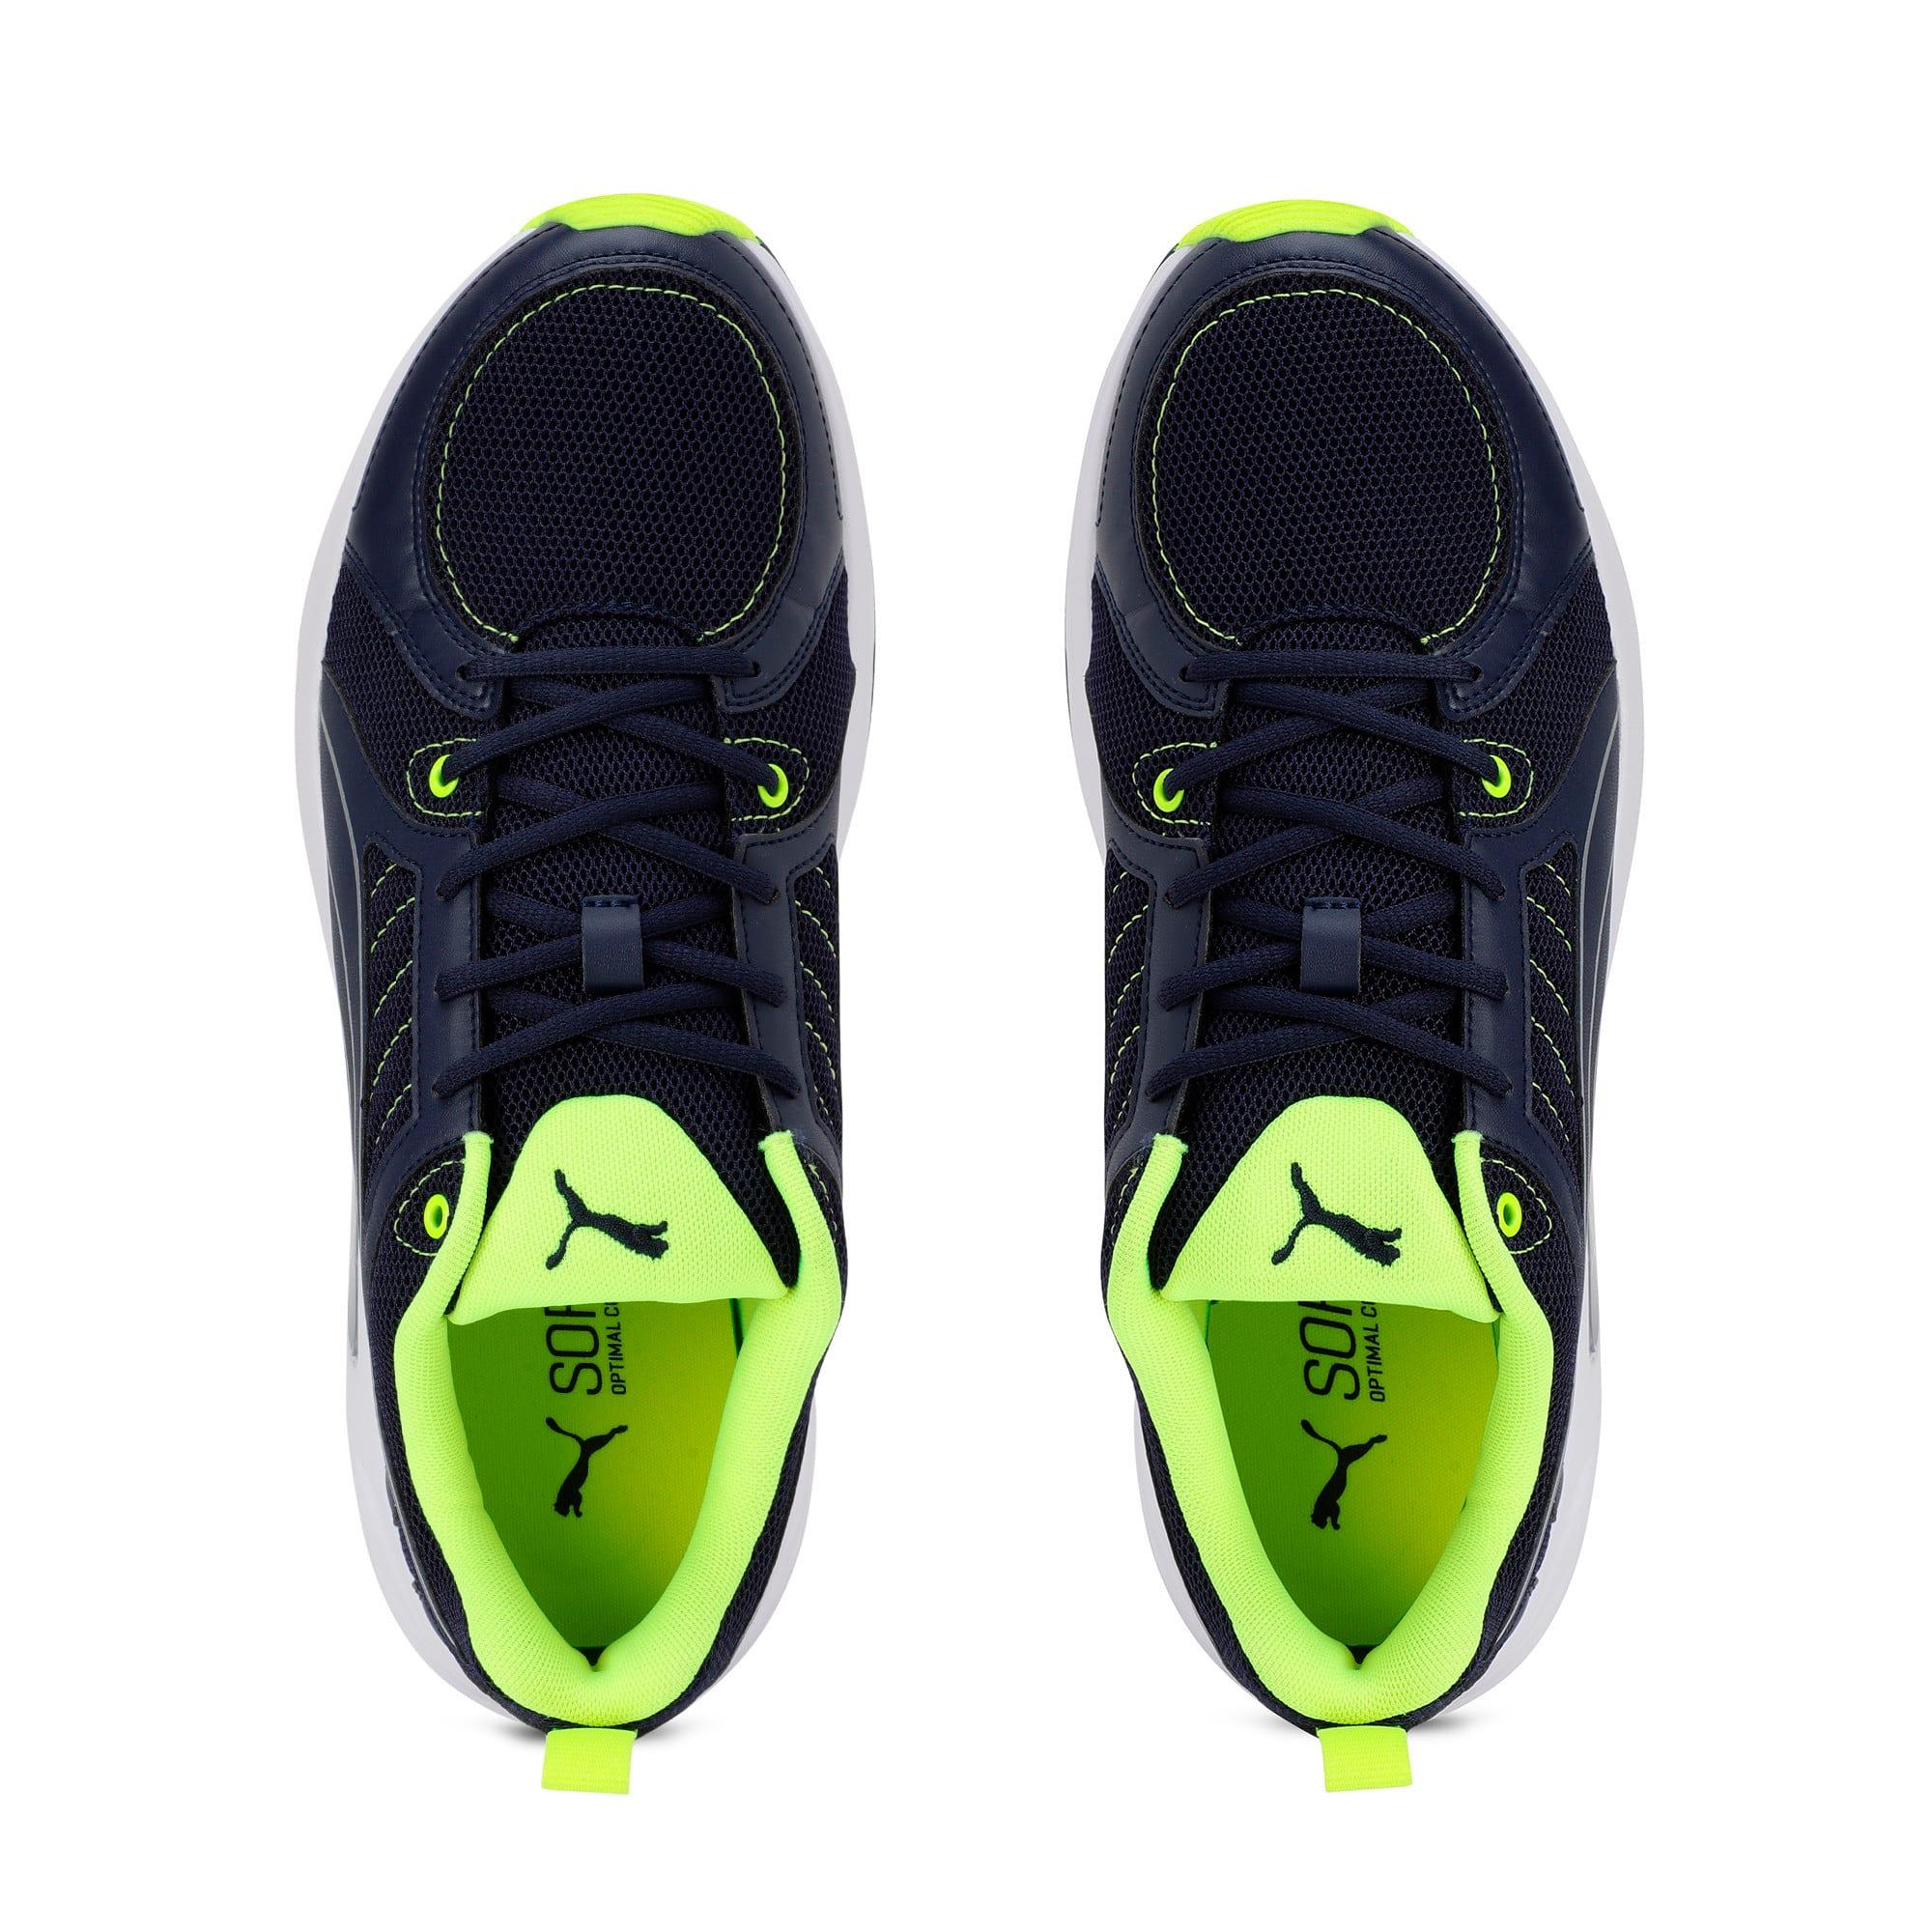 Thumbnail 8 of Nucleus Run Training Shoes, Peacoat-Puma Silver, medium-IND